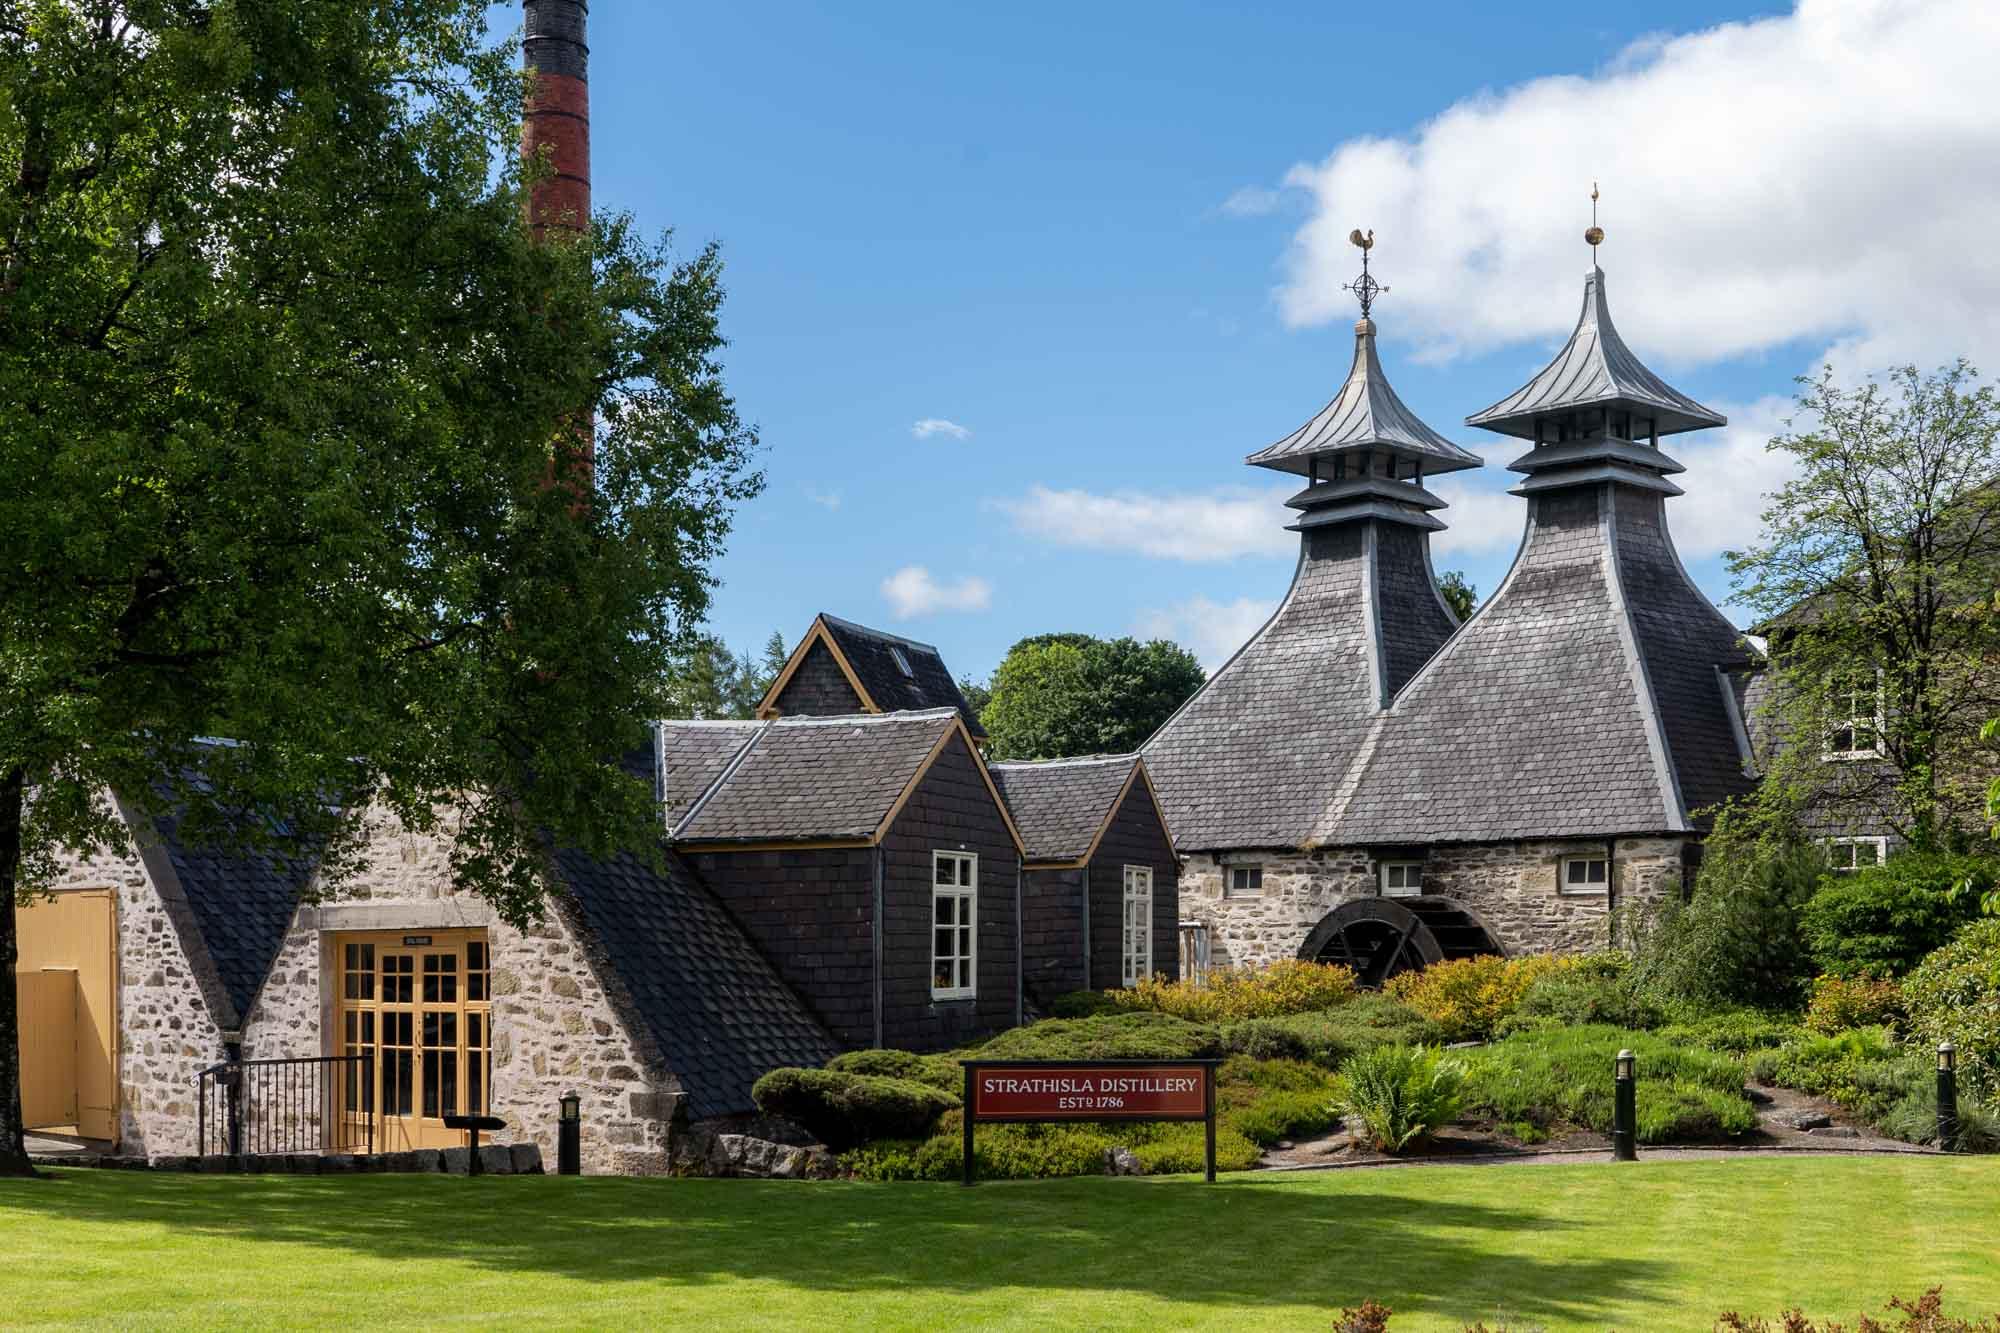 Strathisla distillery in Scotland